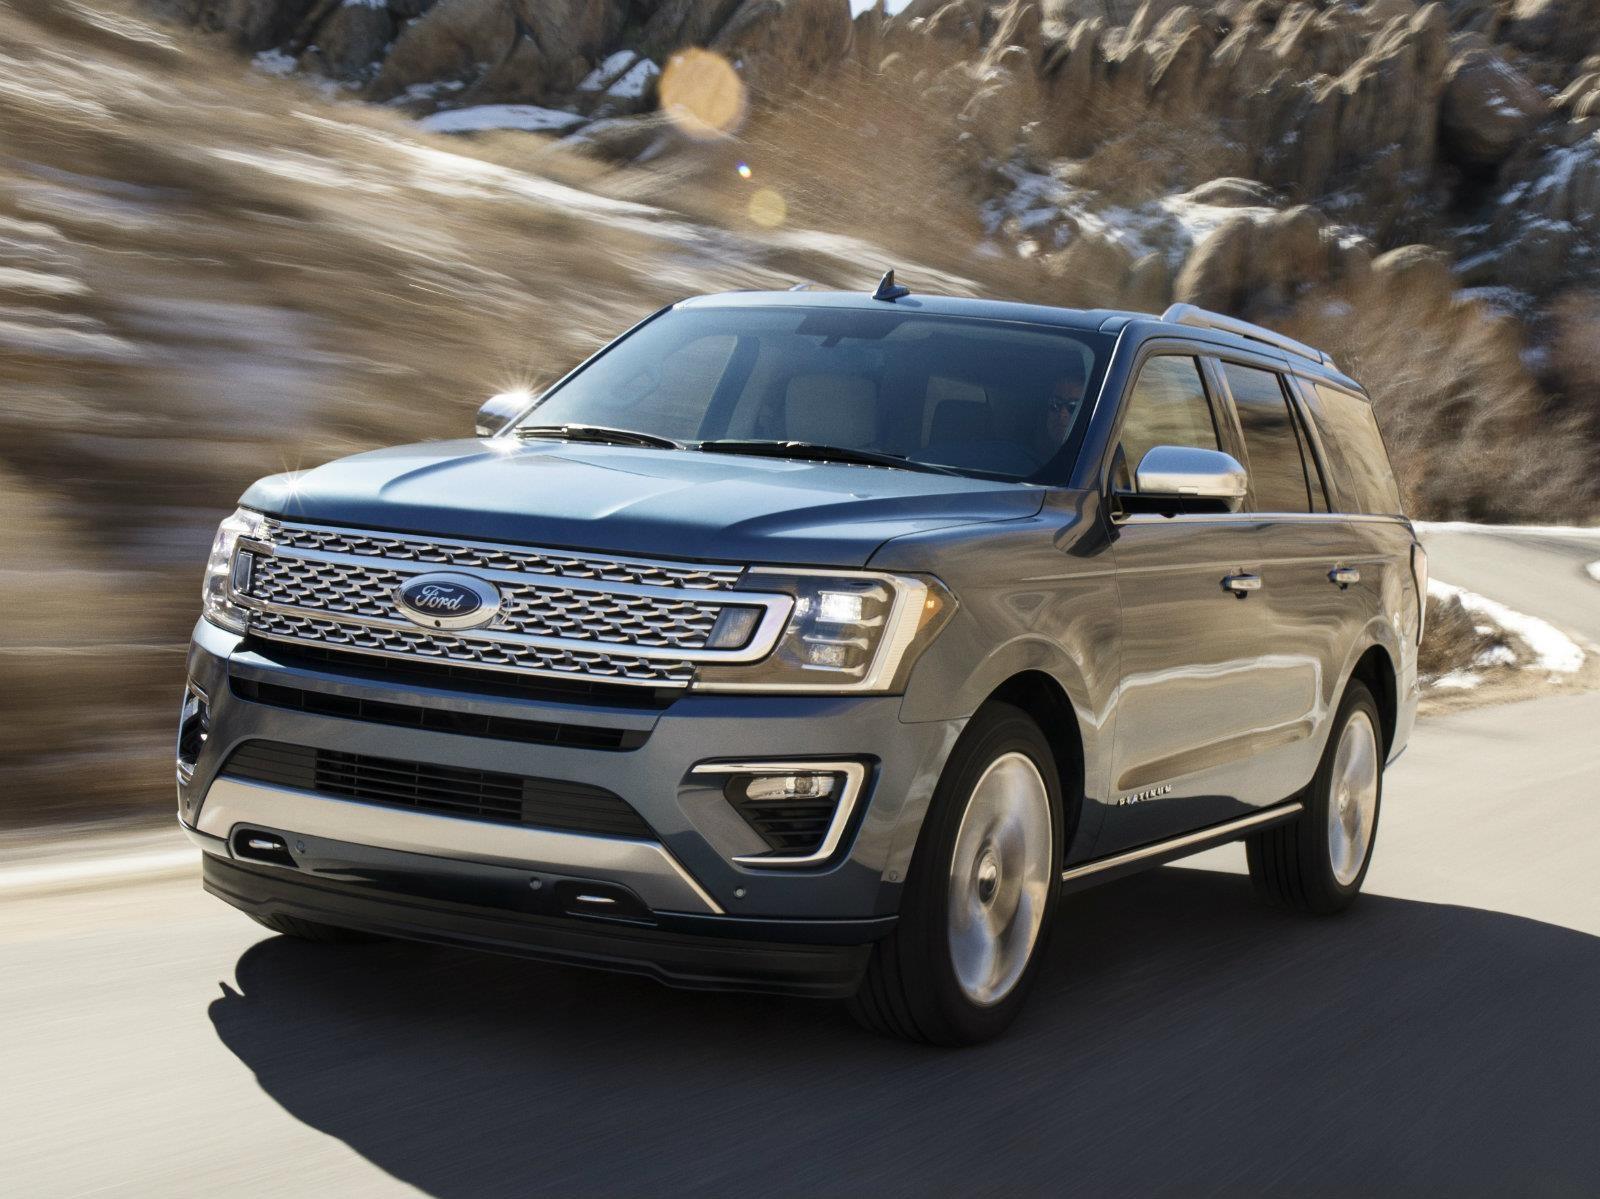 Ford Expedition 2018 se renueva